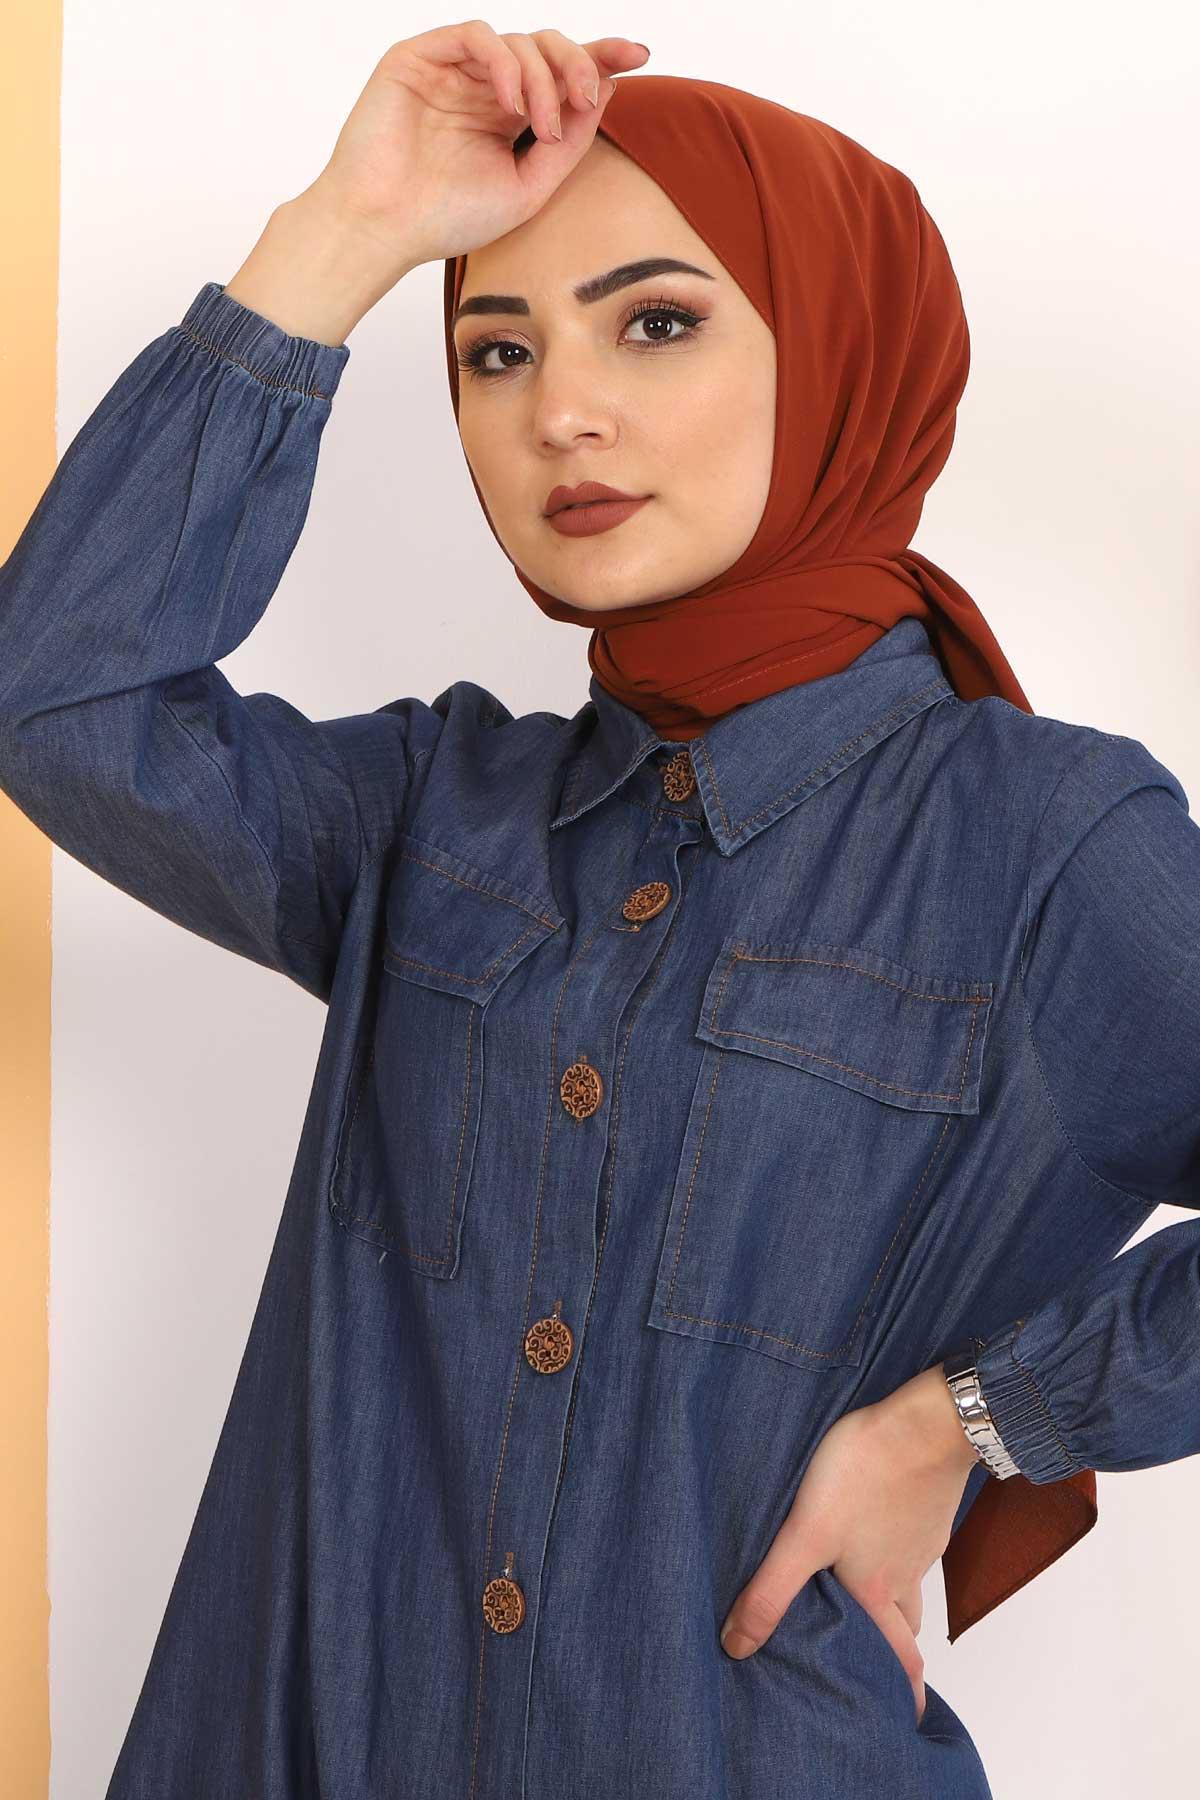 Gathered Skirt Double Jeans Suit TSD0450 Dark Blue